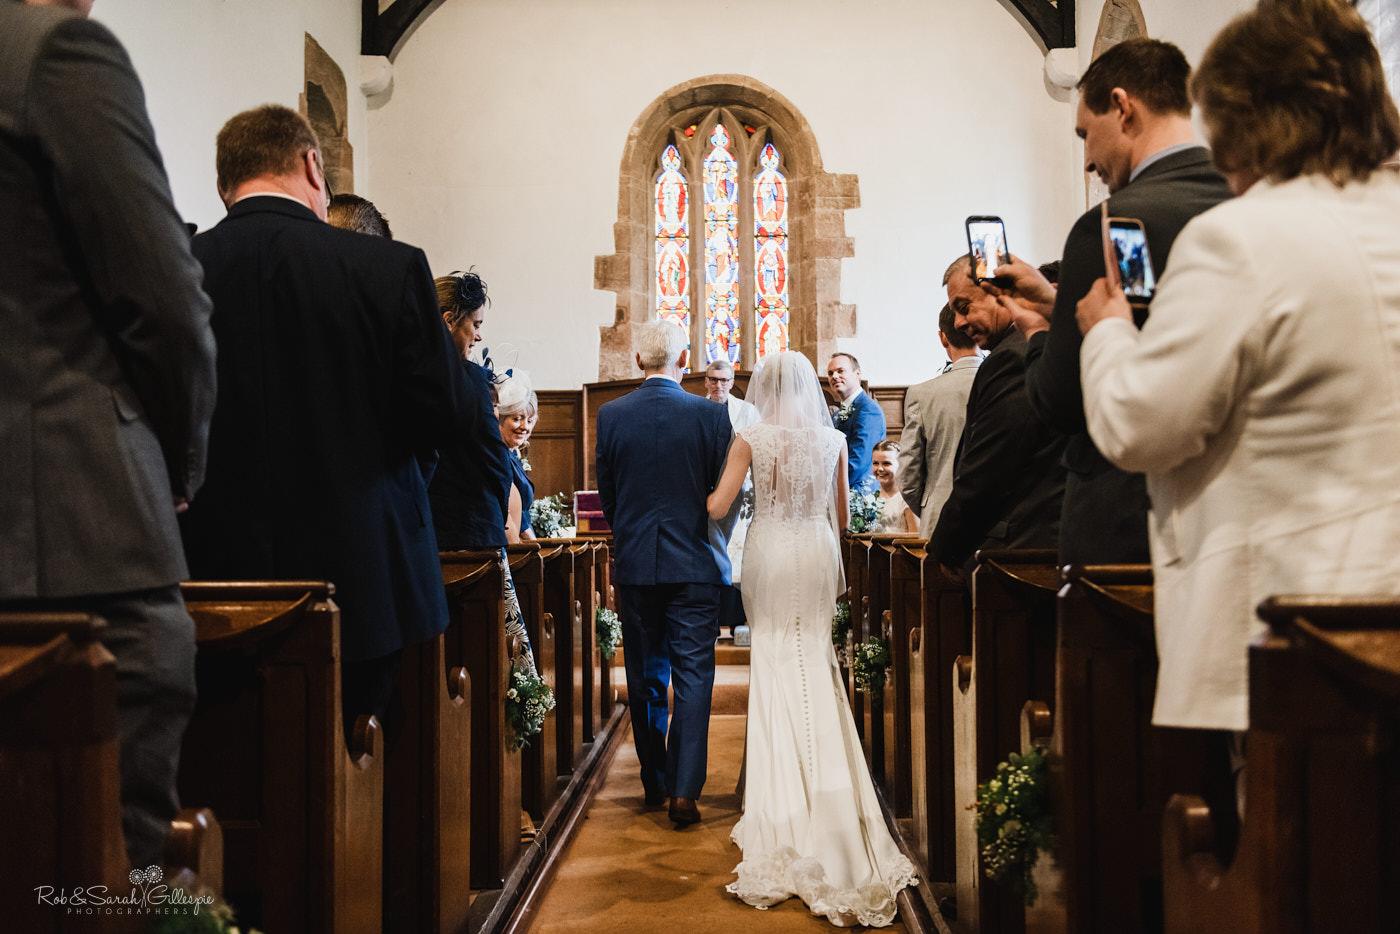 St Kenelm's church Worcestershire wedding ceremony